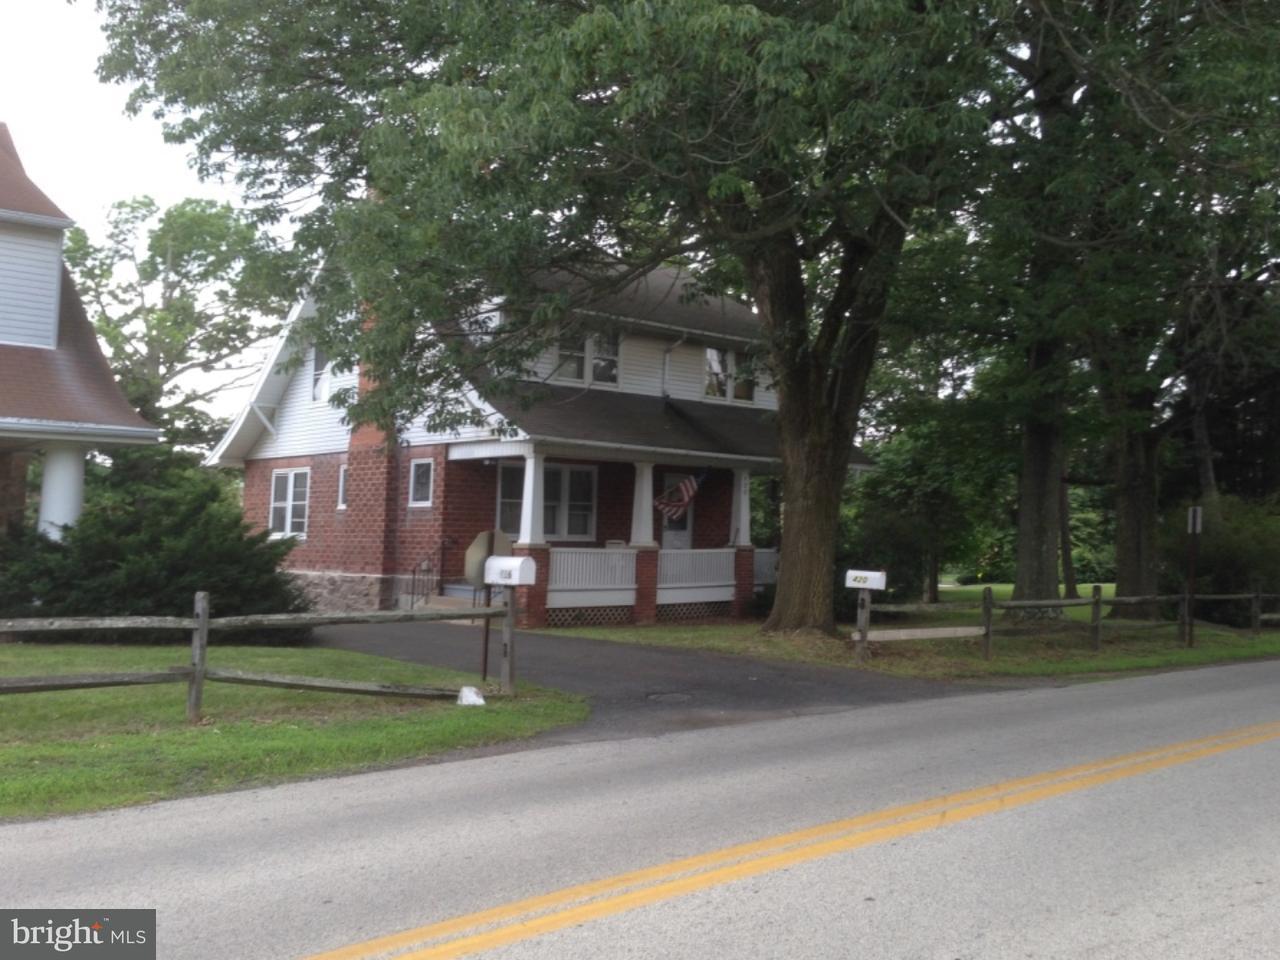 Single Family Home for Rent at 420 N SPRING GARDEN Street Ambler, Pennsylvania 19002 United States